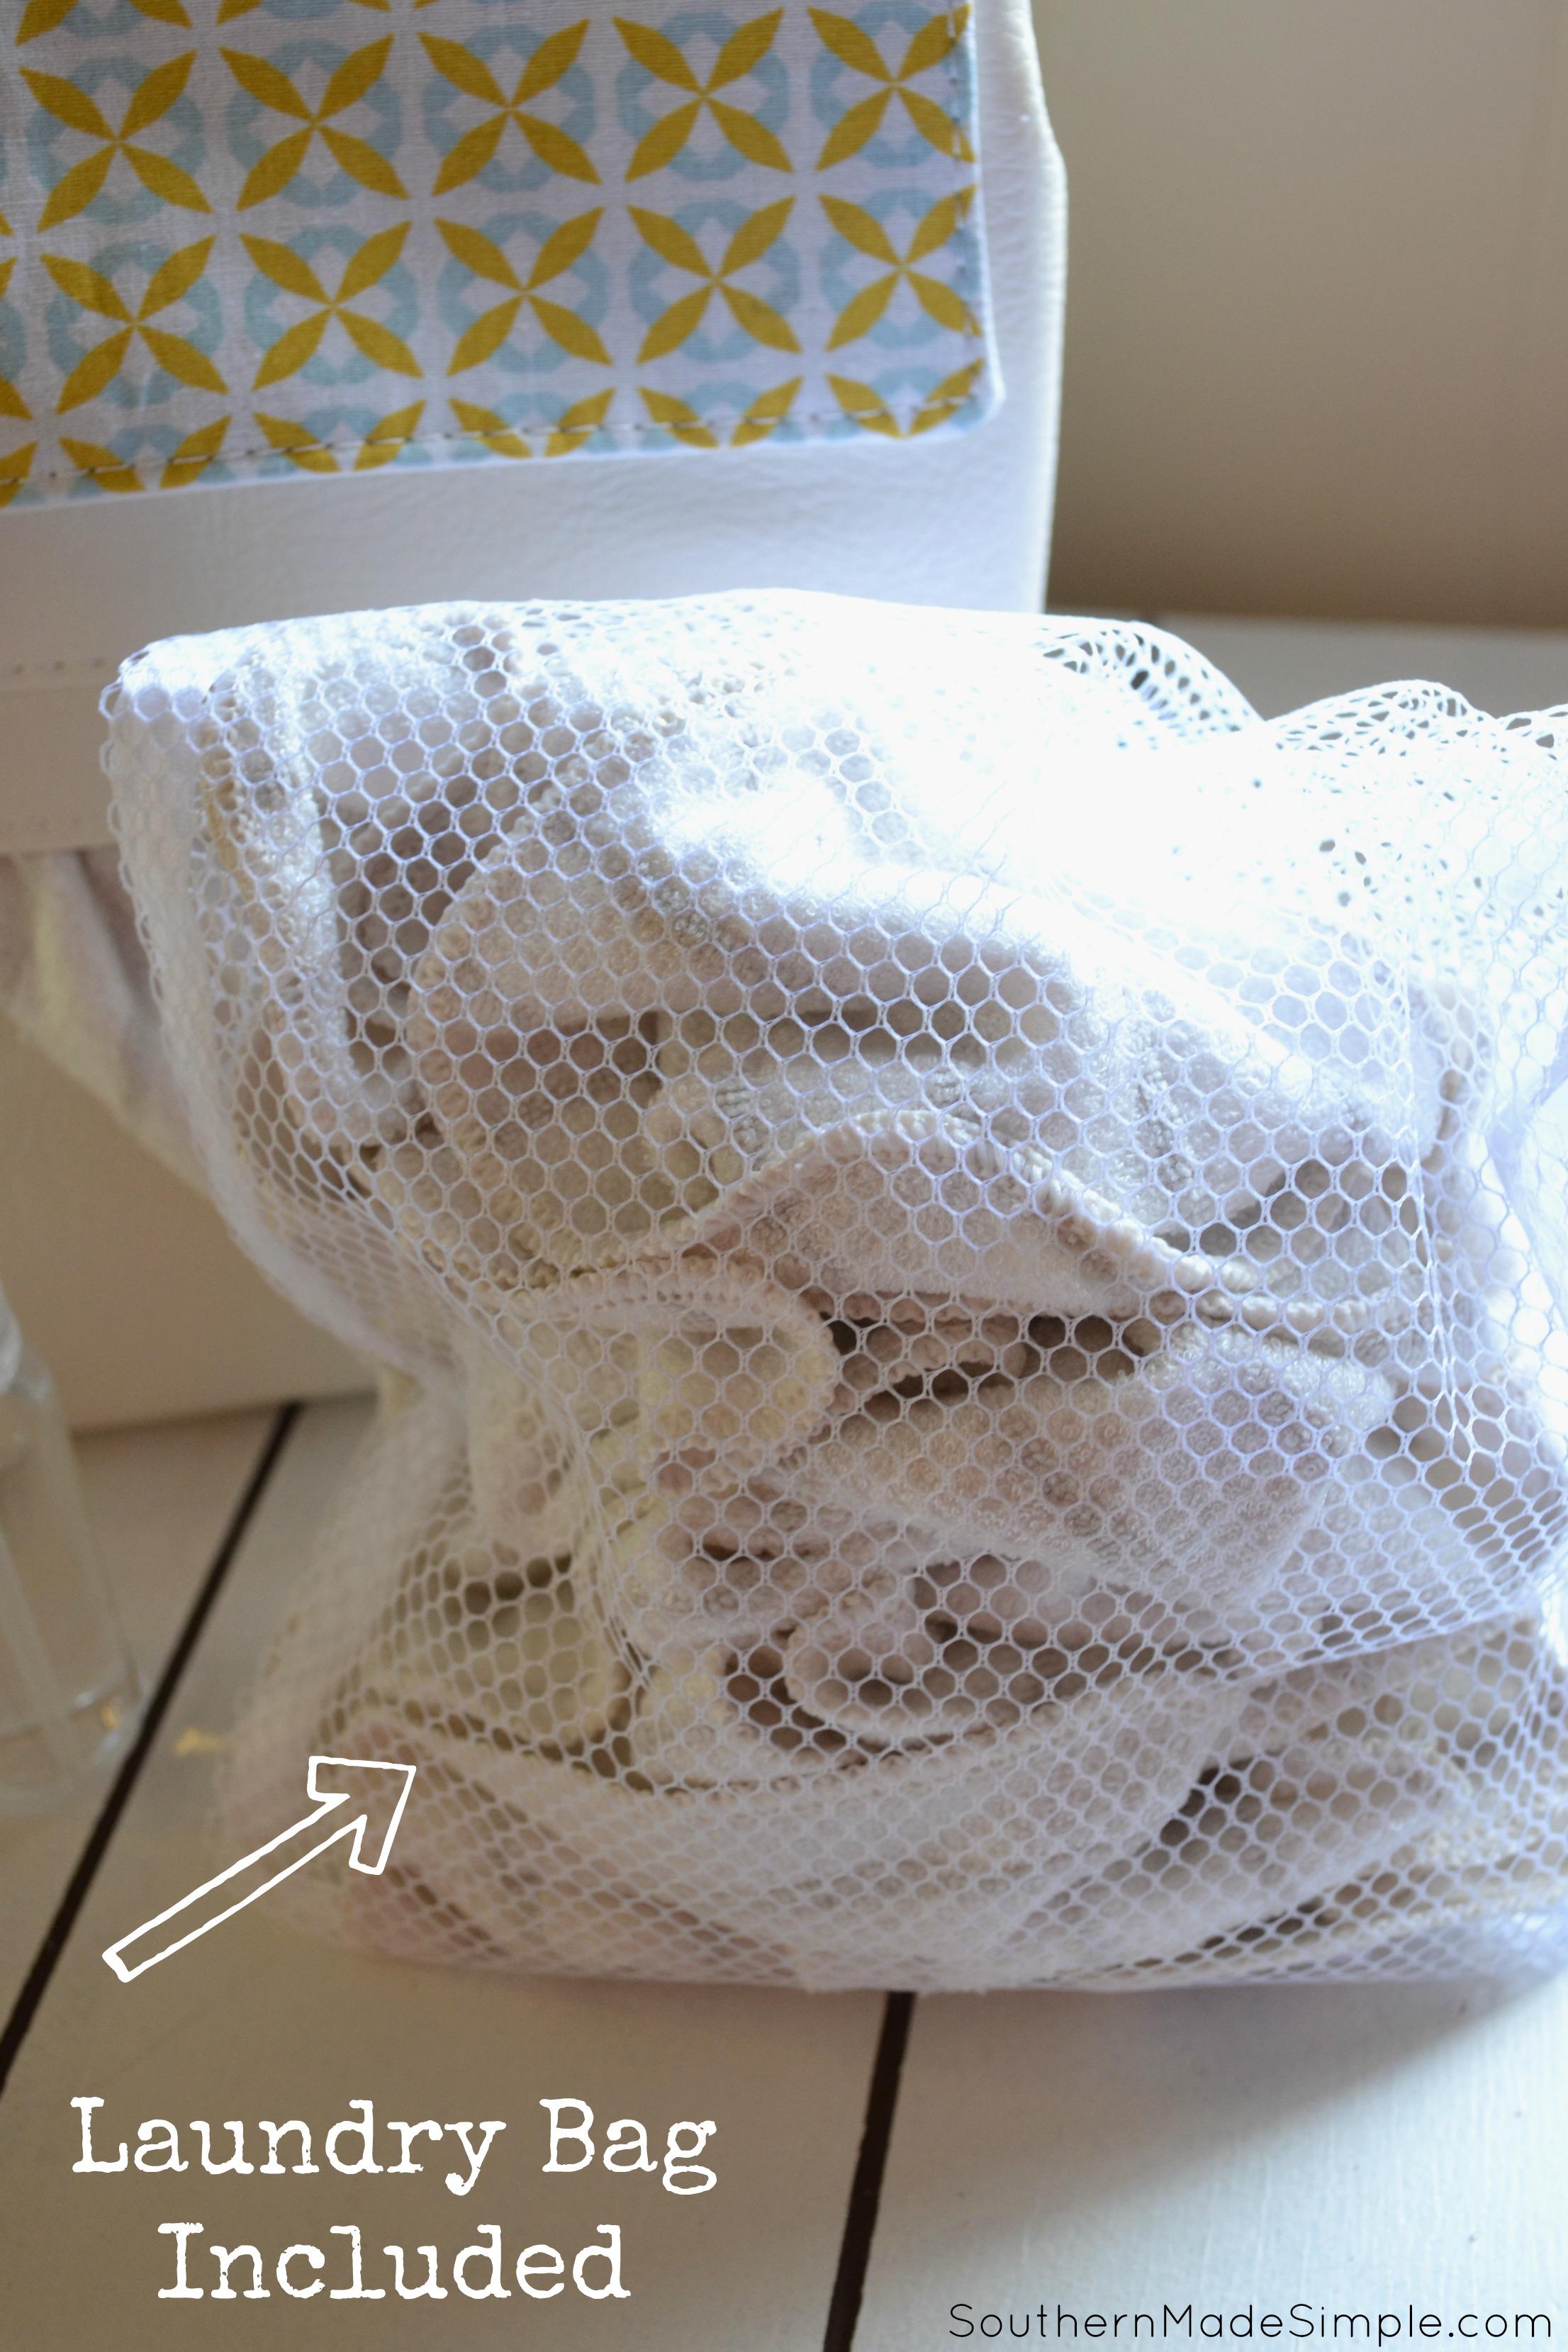 Keep Germs Away Water E-Cloth!